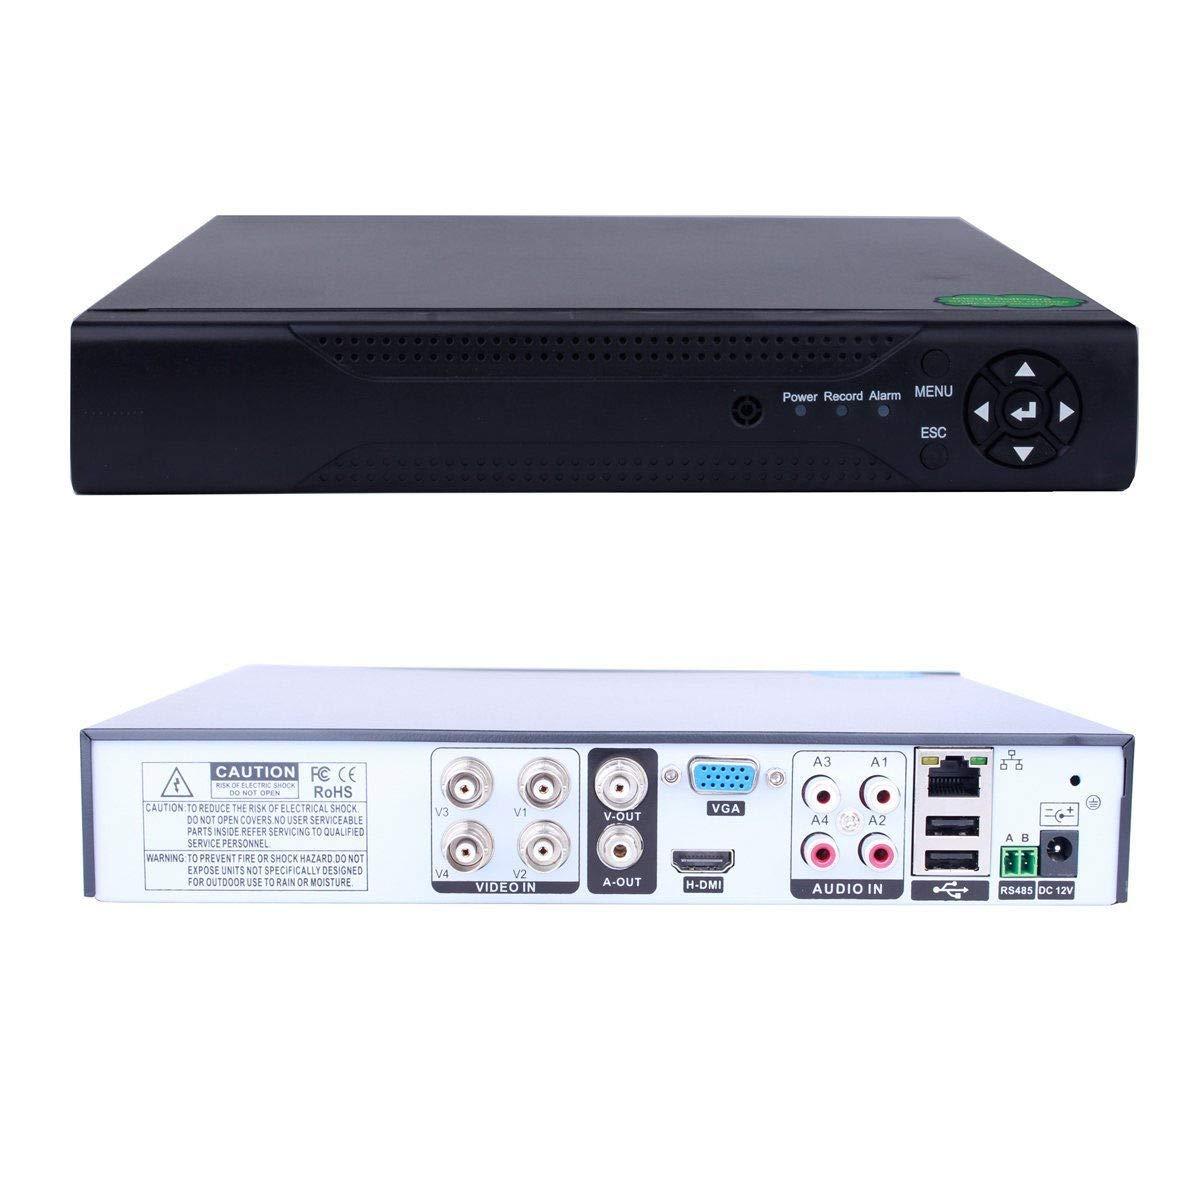 FidgetFidget DVR Recorde 6in1 4CH H.264 HDMI DVR/NVR/AHD/TVI/CVI/XVI IP Security CCTV Camera